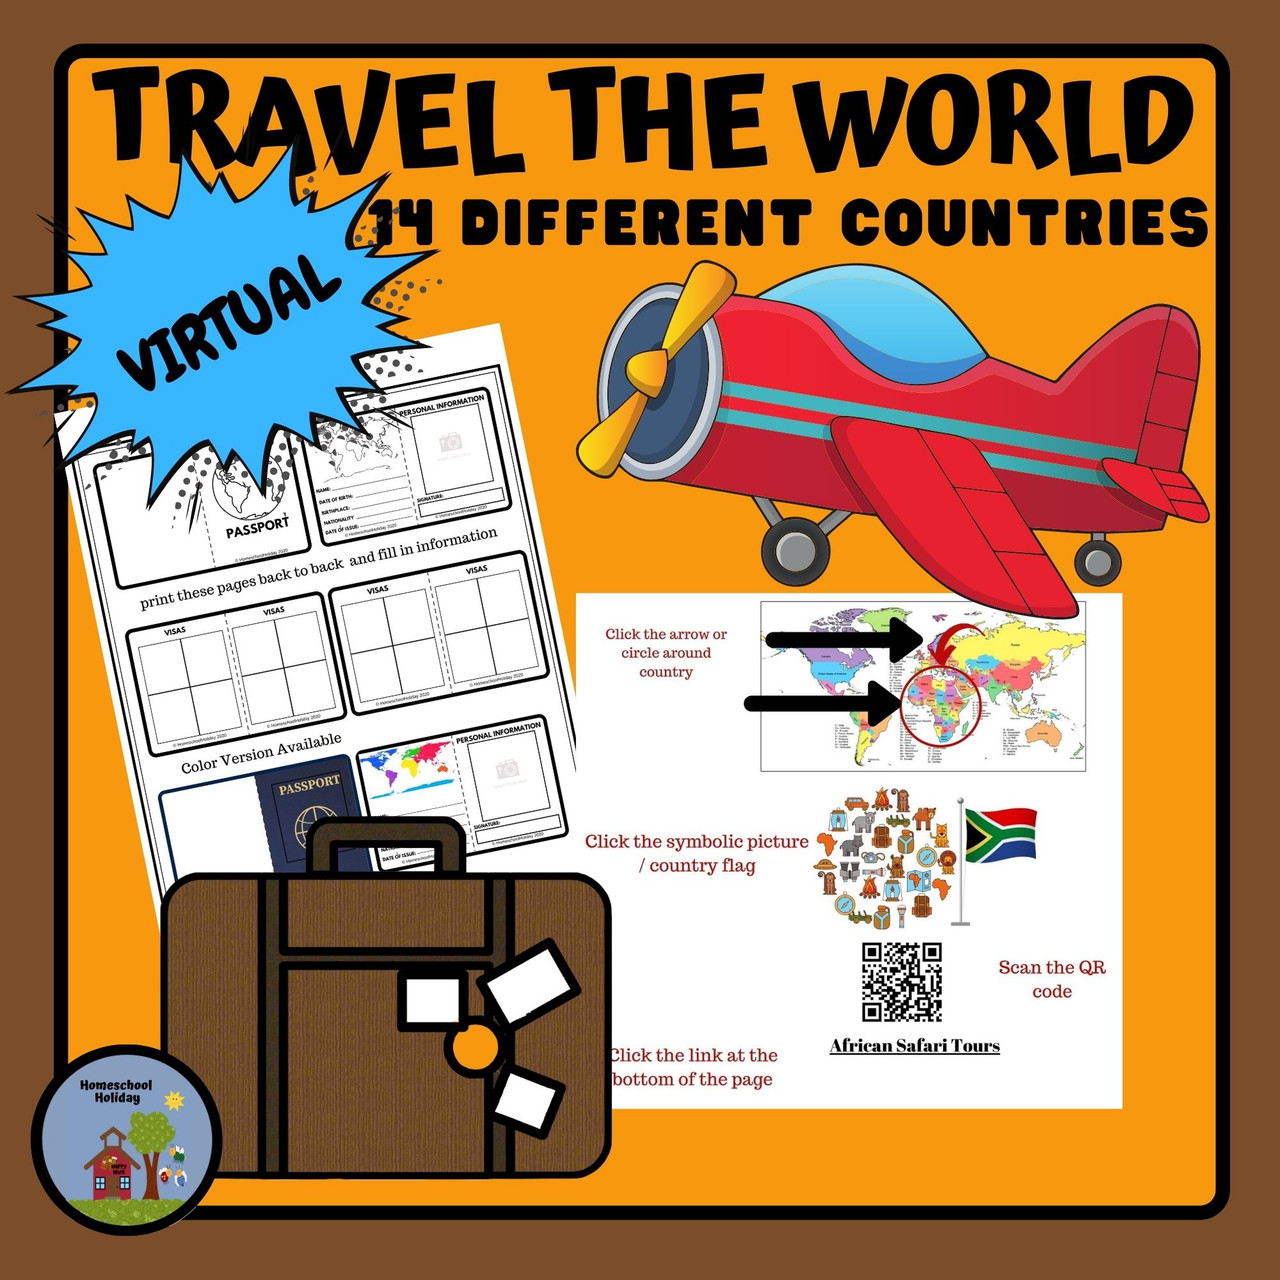 Travel around the World - Visit 14 countries